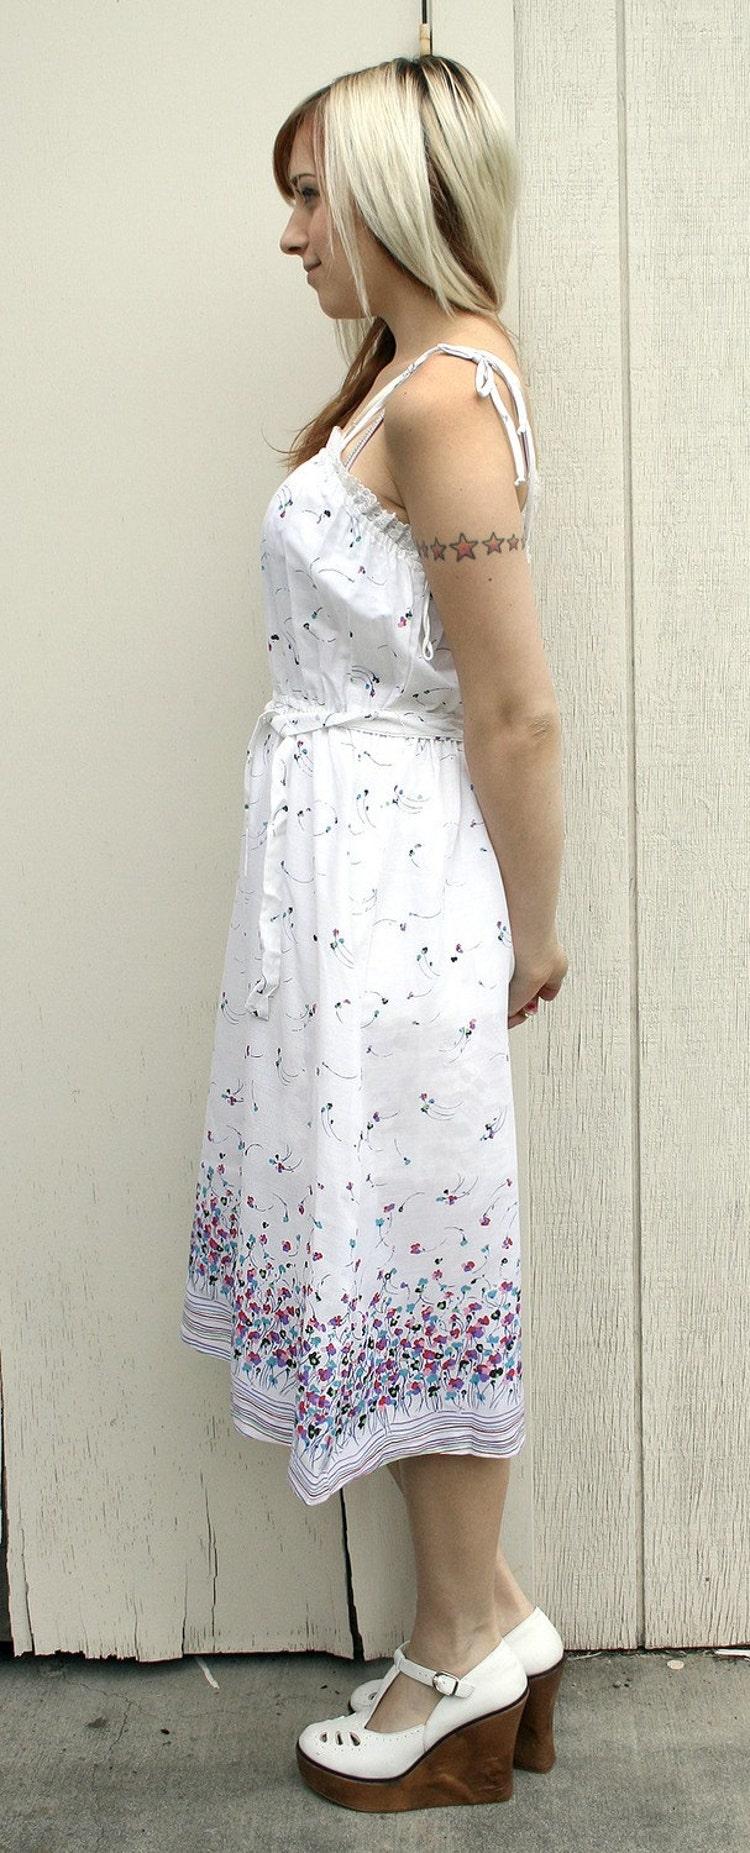 Flirty Fun Vintage White Floral Sundress By Zwzzy On Etsy